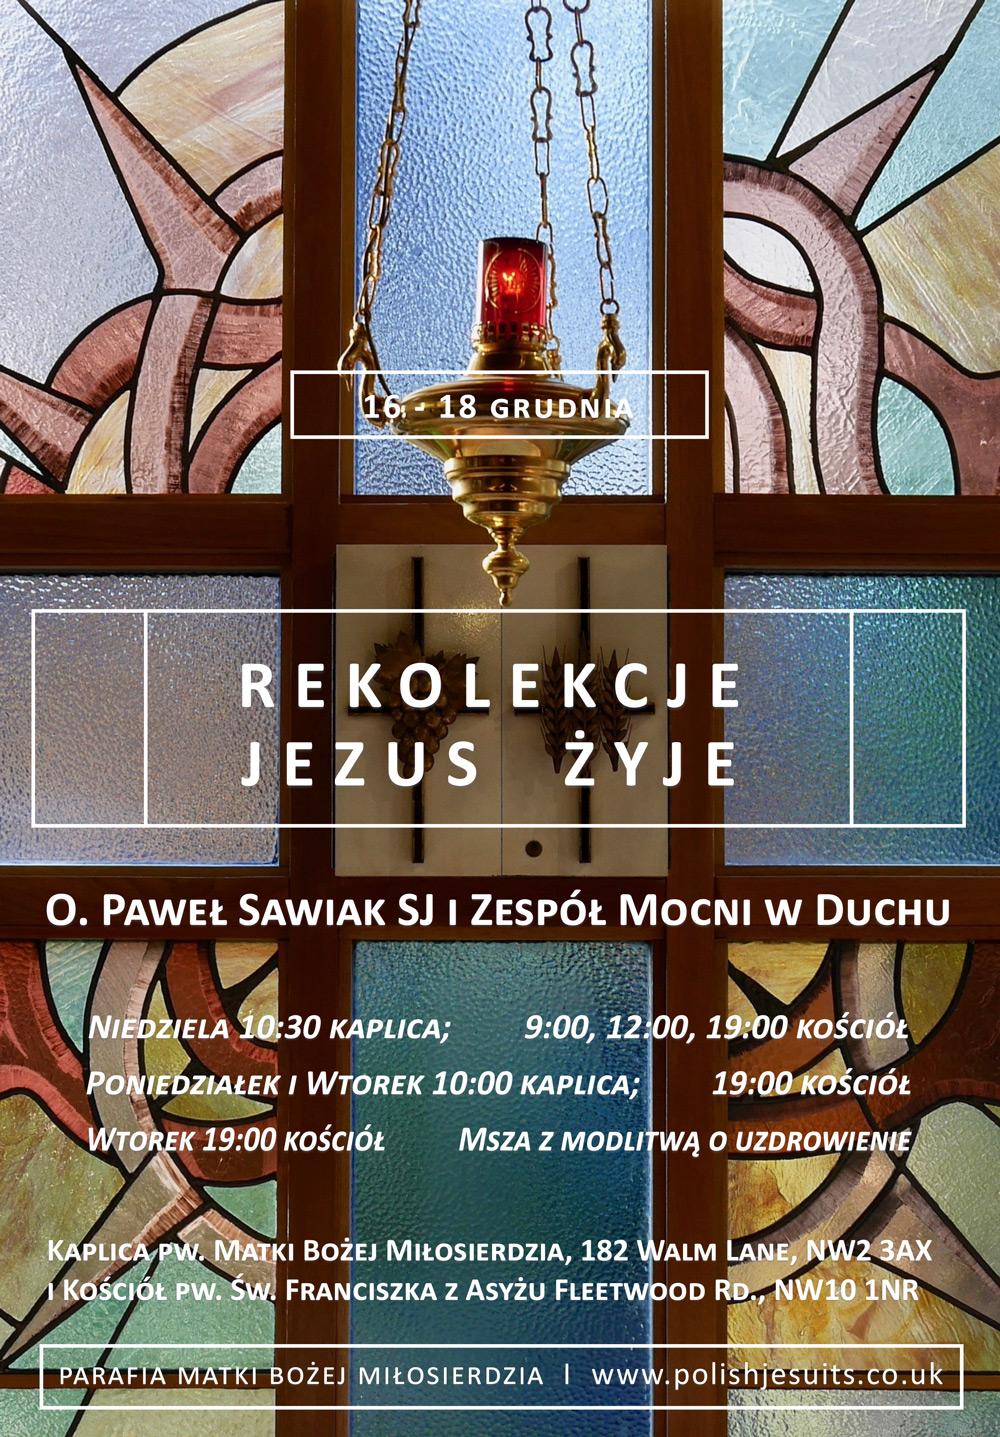 Rekolekcje - Jezus żyje - 12.2018